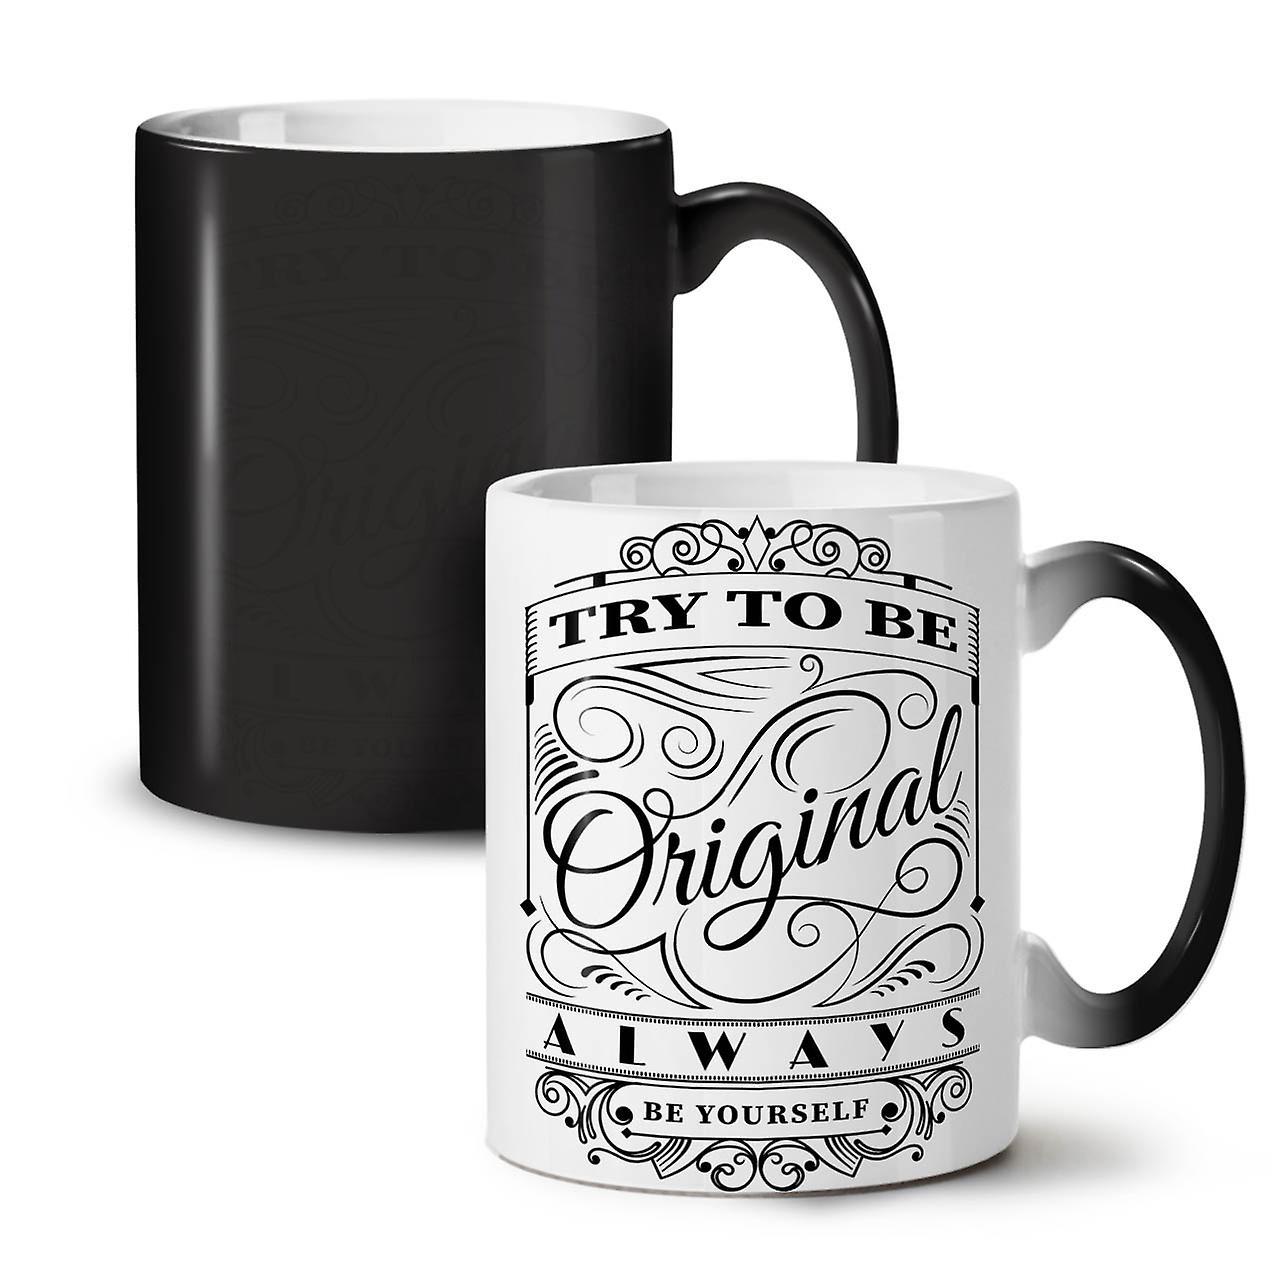 Try Ceramic To Colour 11 OzWellcoda Black Coffee Be Mug Unique Tea Changing New kXTOPuiZ